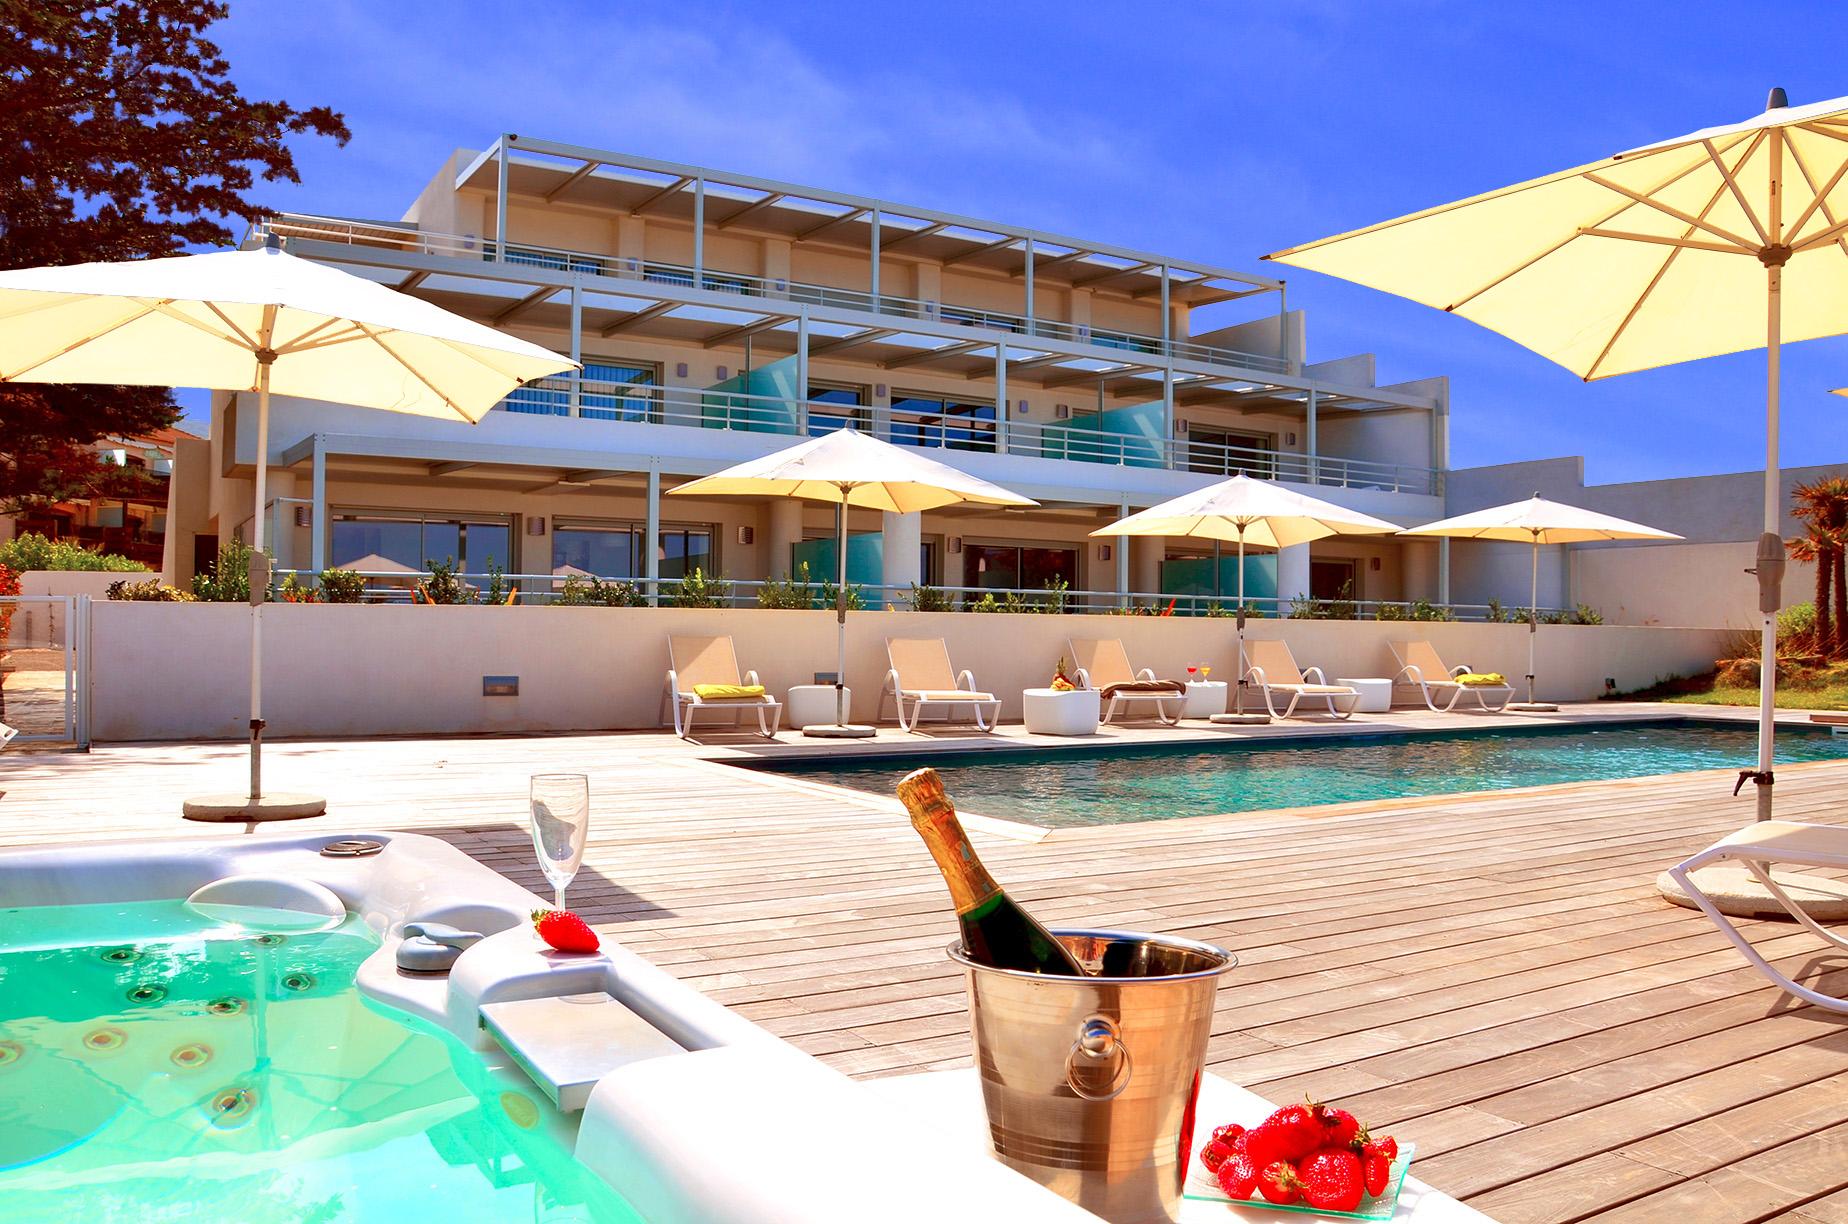 R sidence h teli re de luxe 5 sur la plage ile rousse for Residence hoteliere